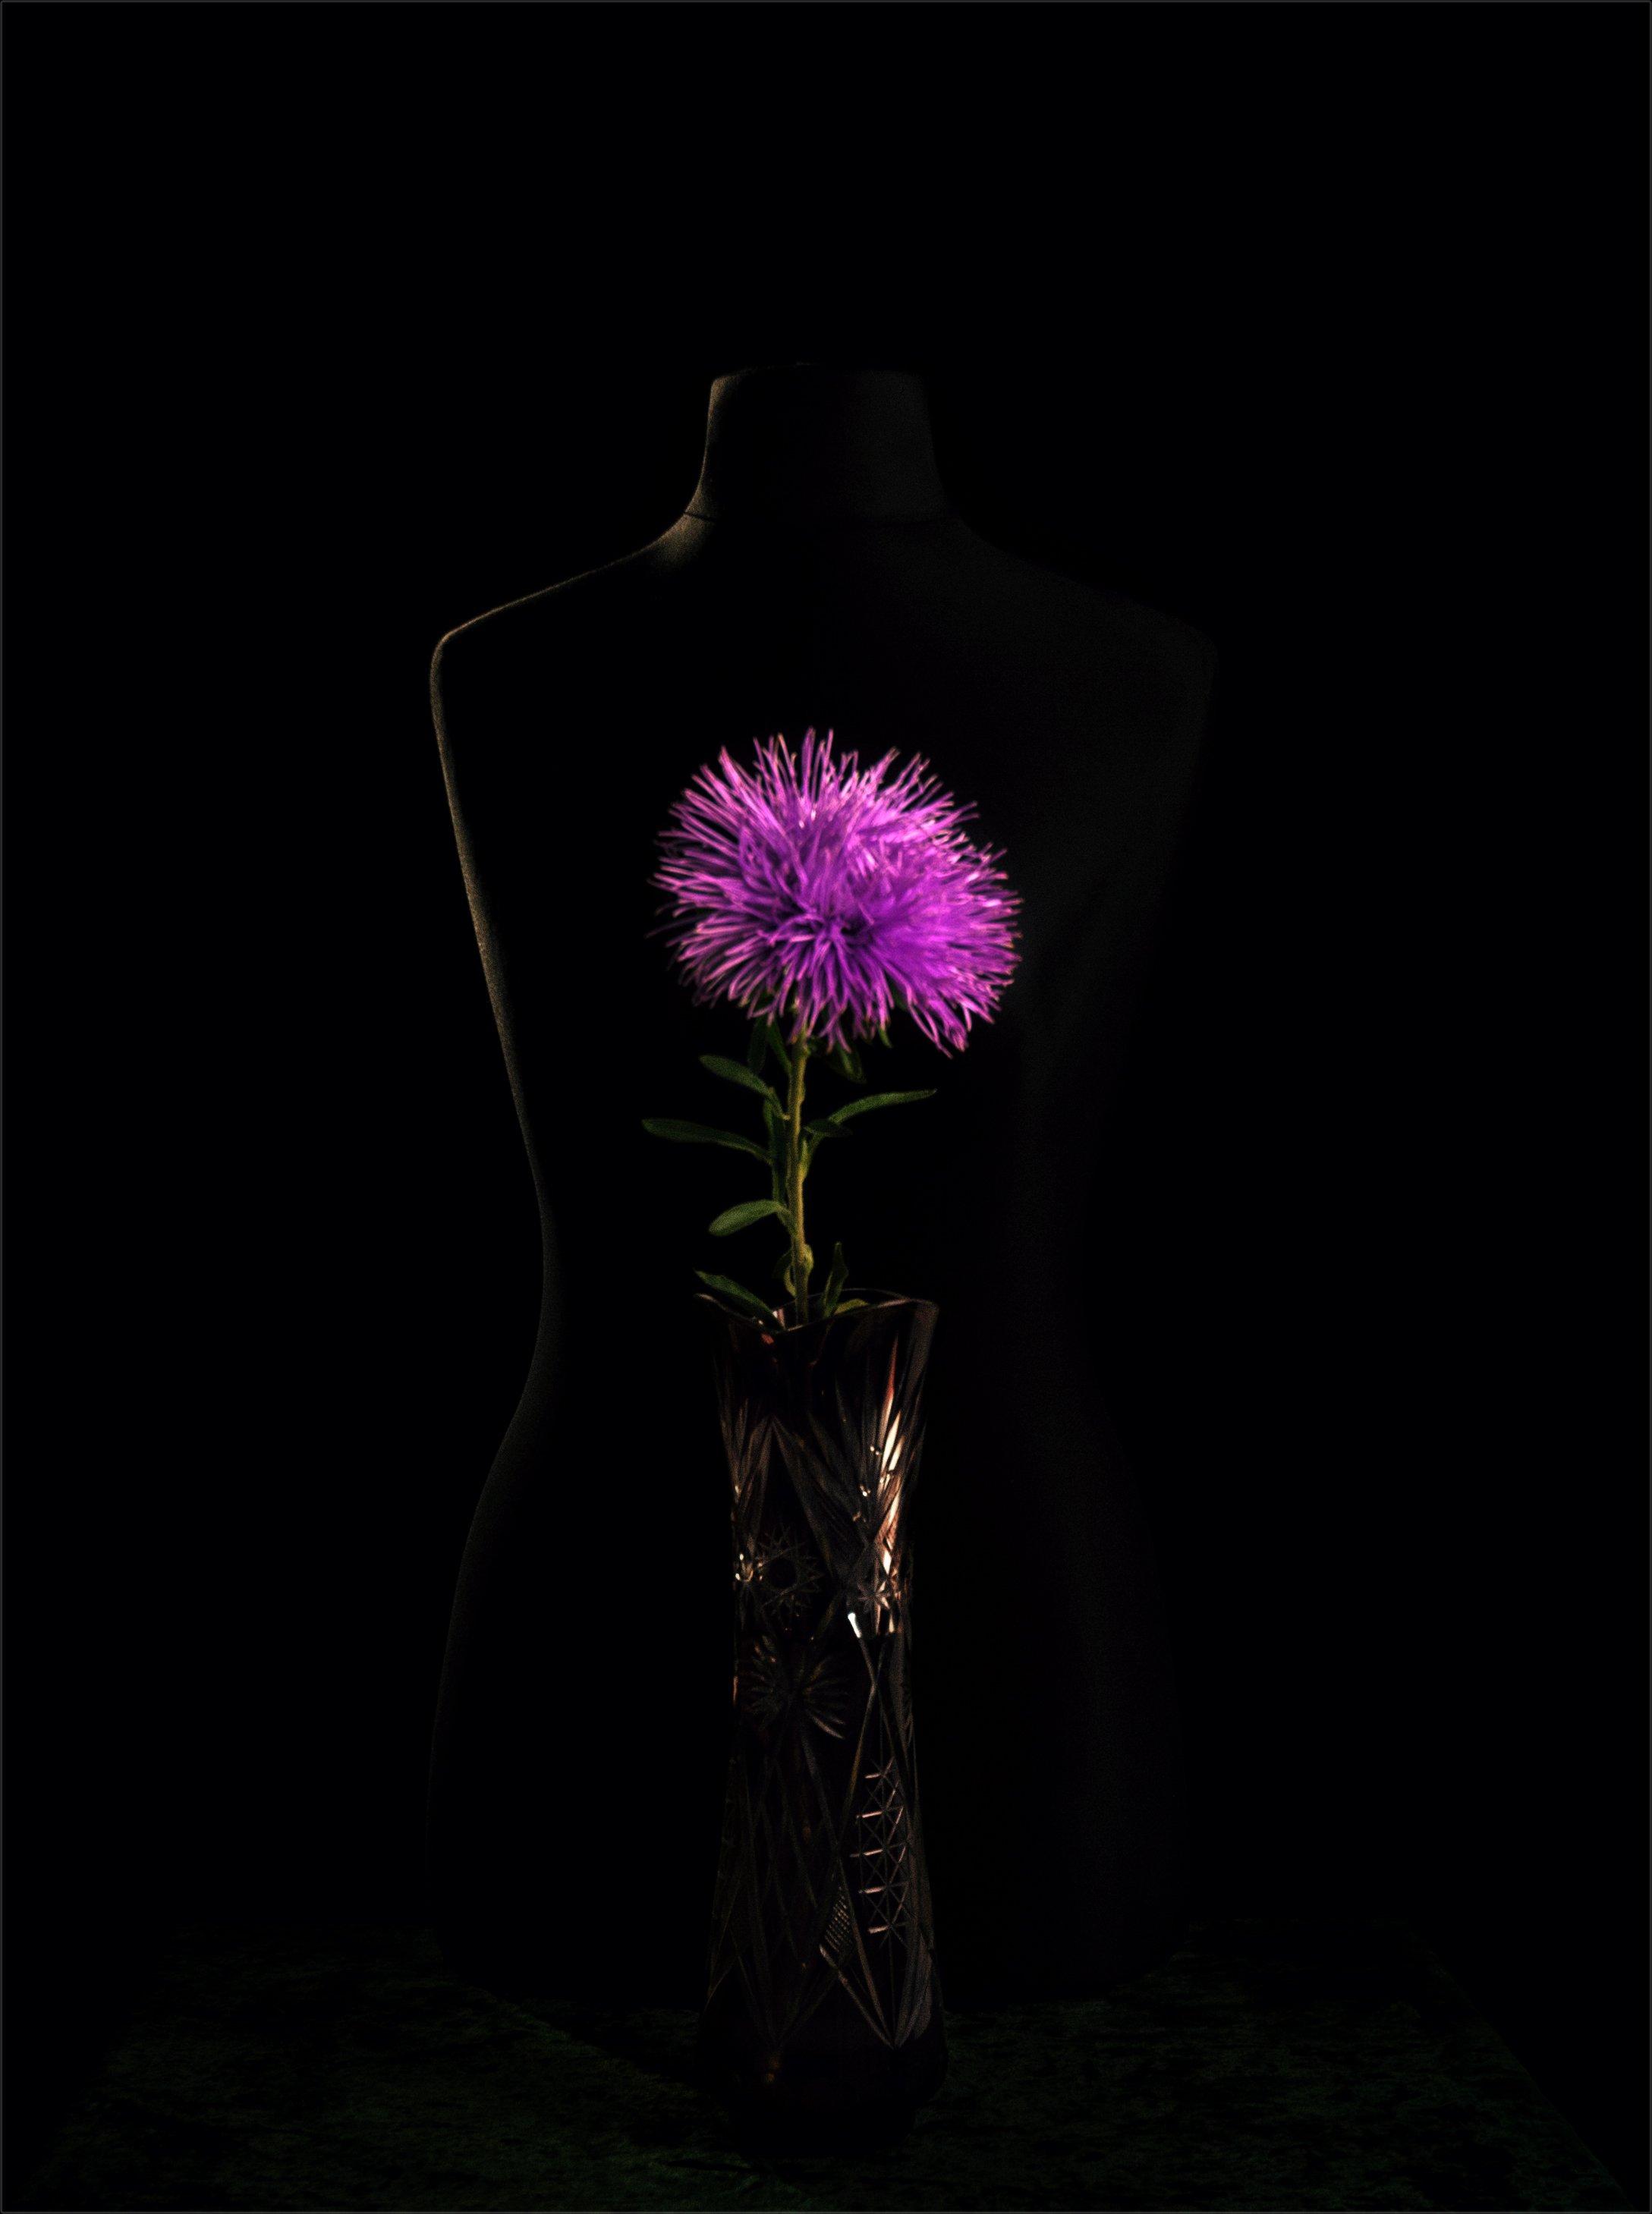 still life, натюрморт,   винтаж, минимализм, астра, цветок, ваза, манекен, бюст, Михаил MSH